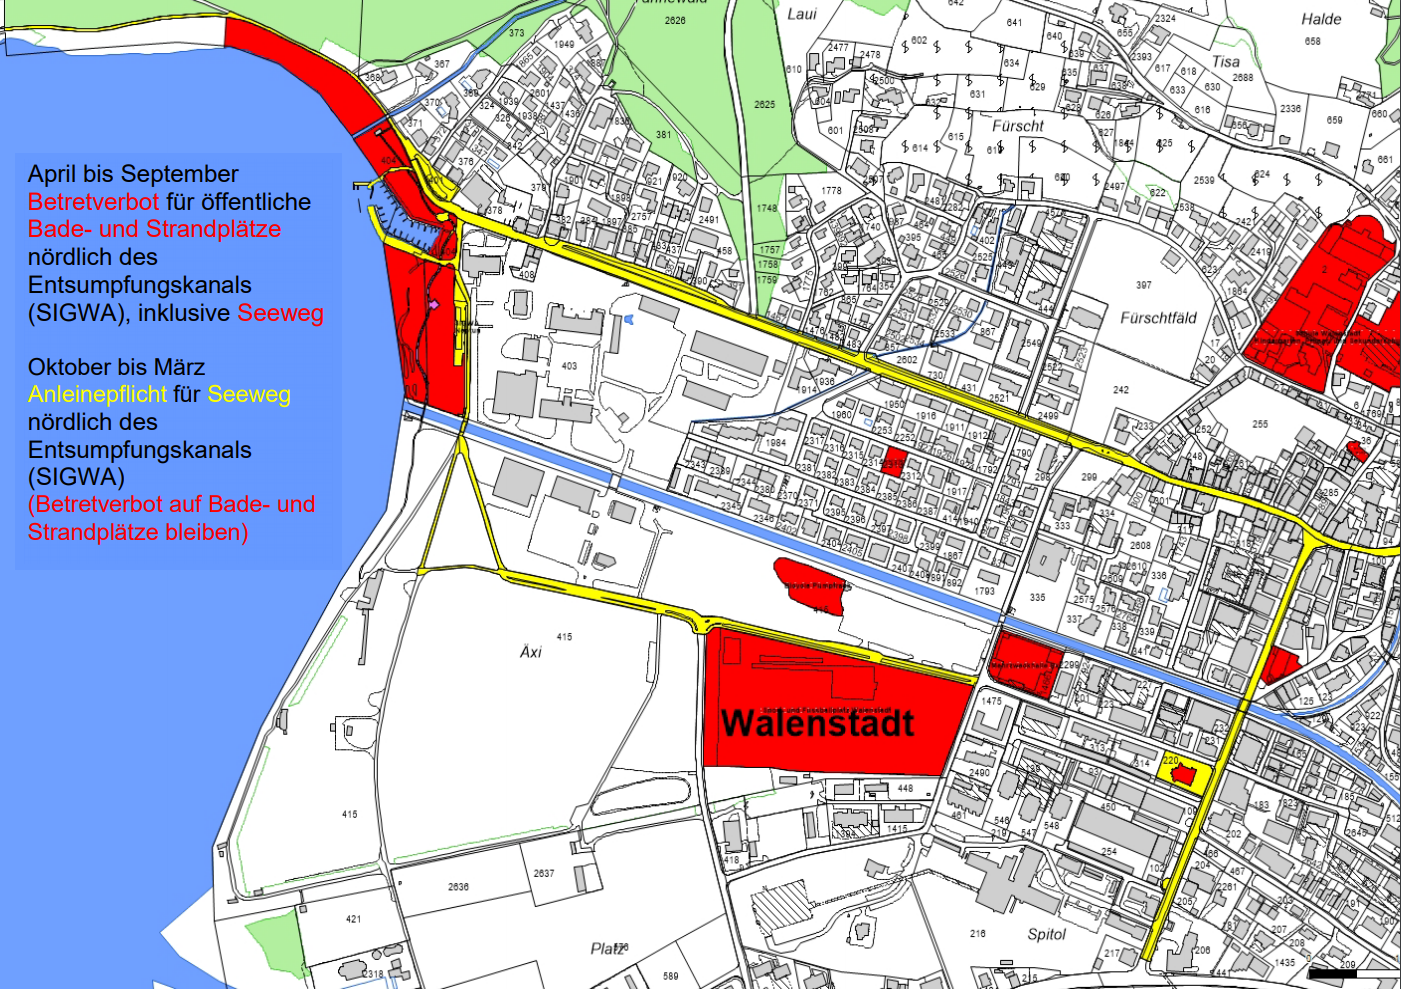 In den roten Zonen gilt das Hundeverbot. (Karte: walenstadt.ch)